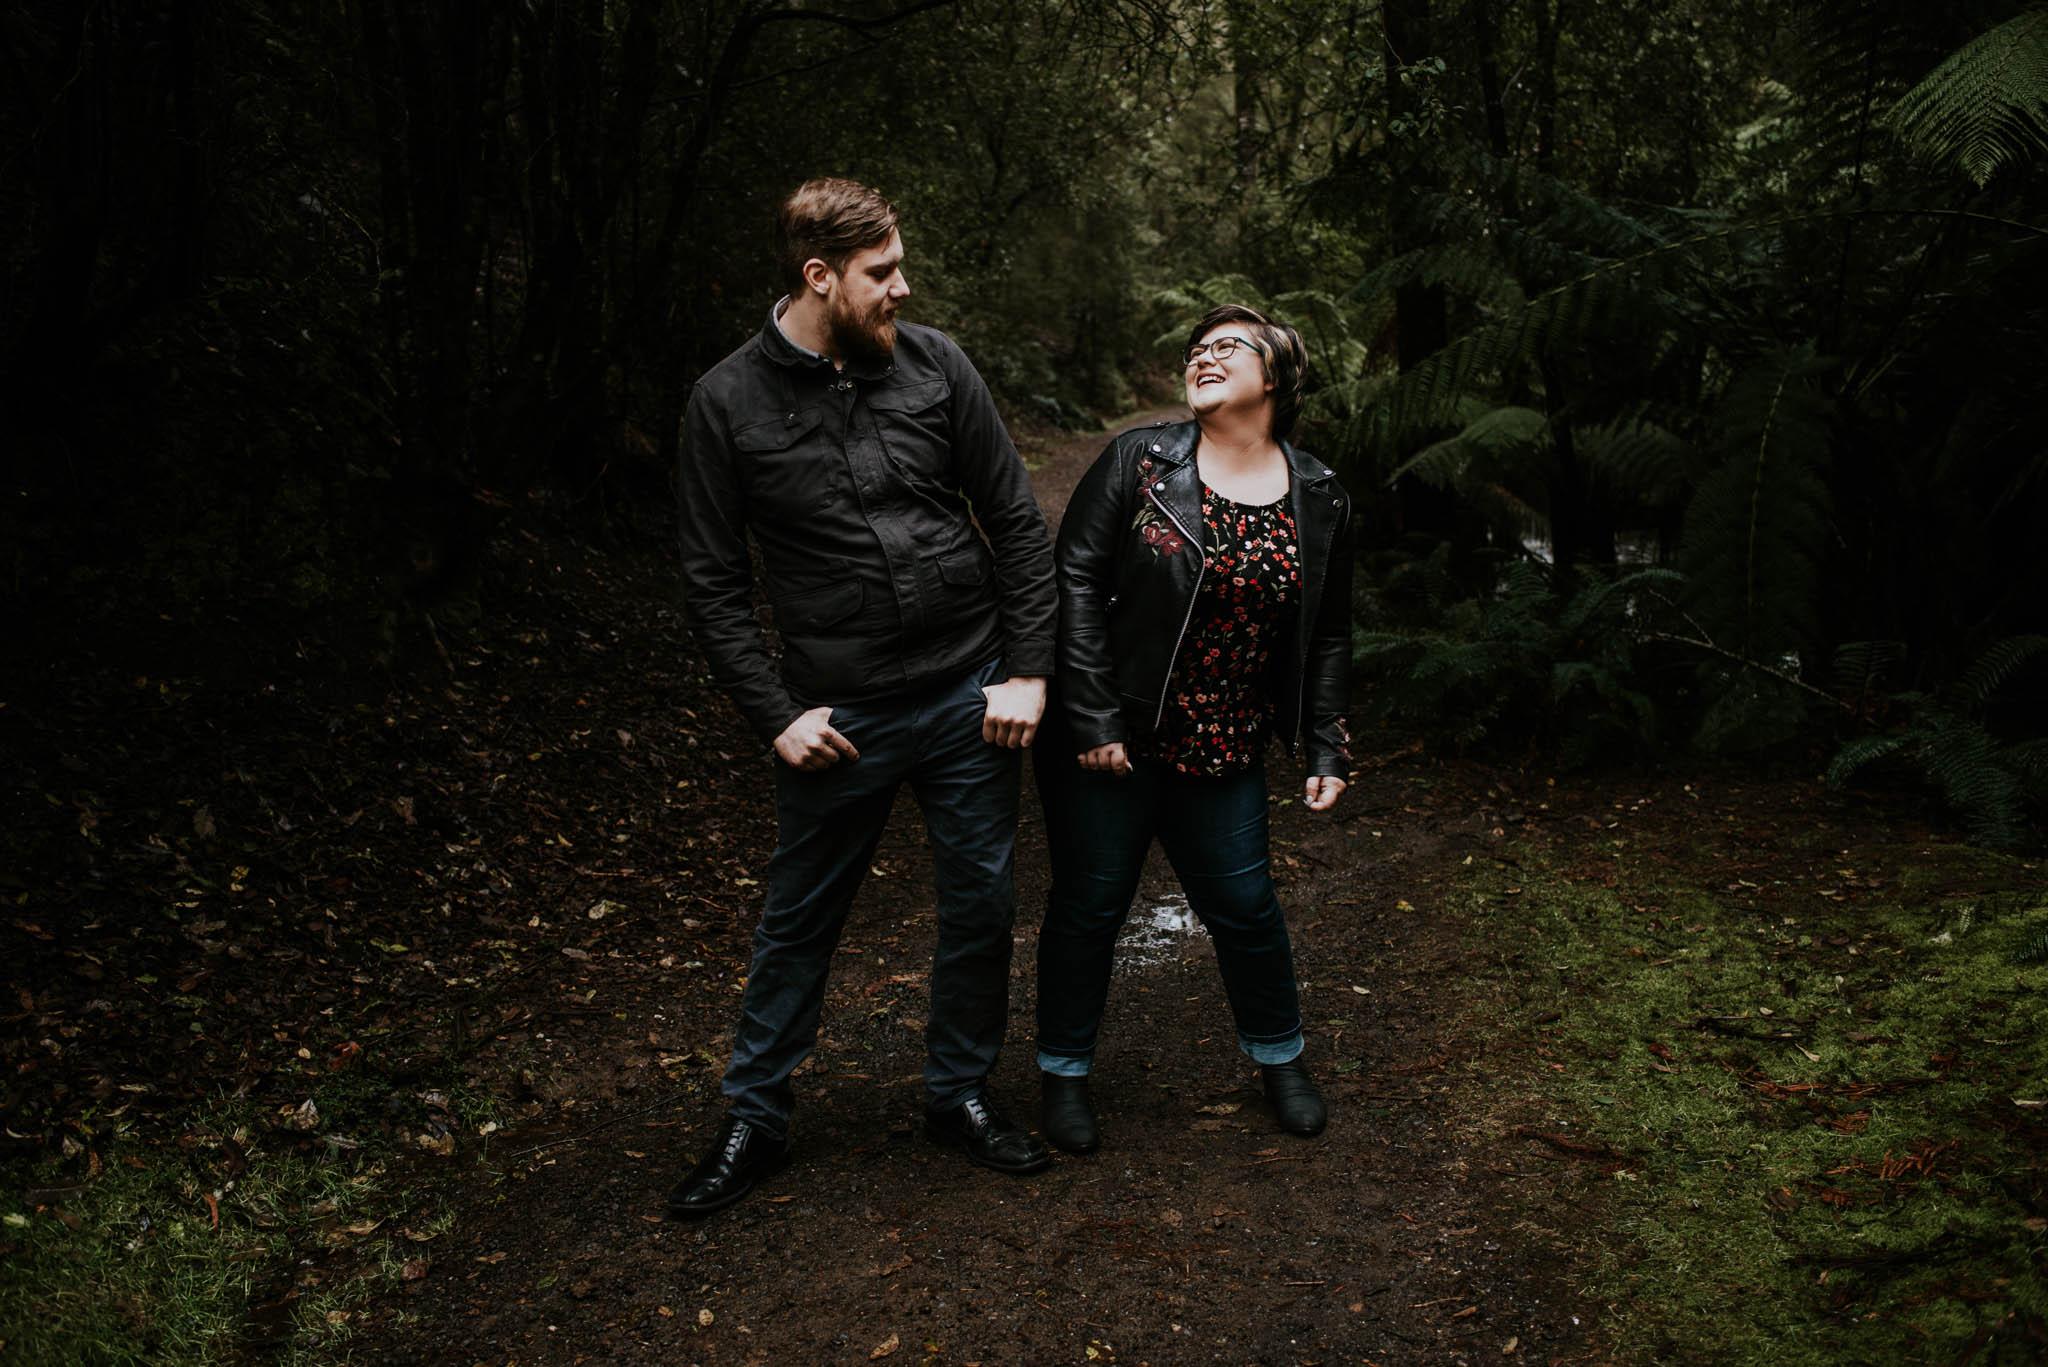 launceston couples photographer-3.jpg